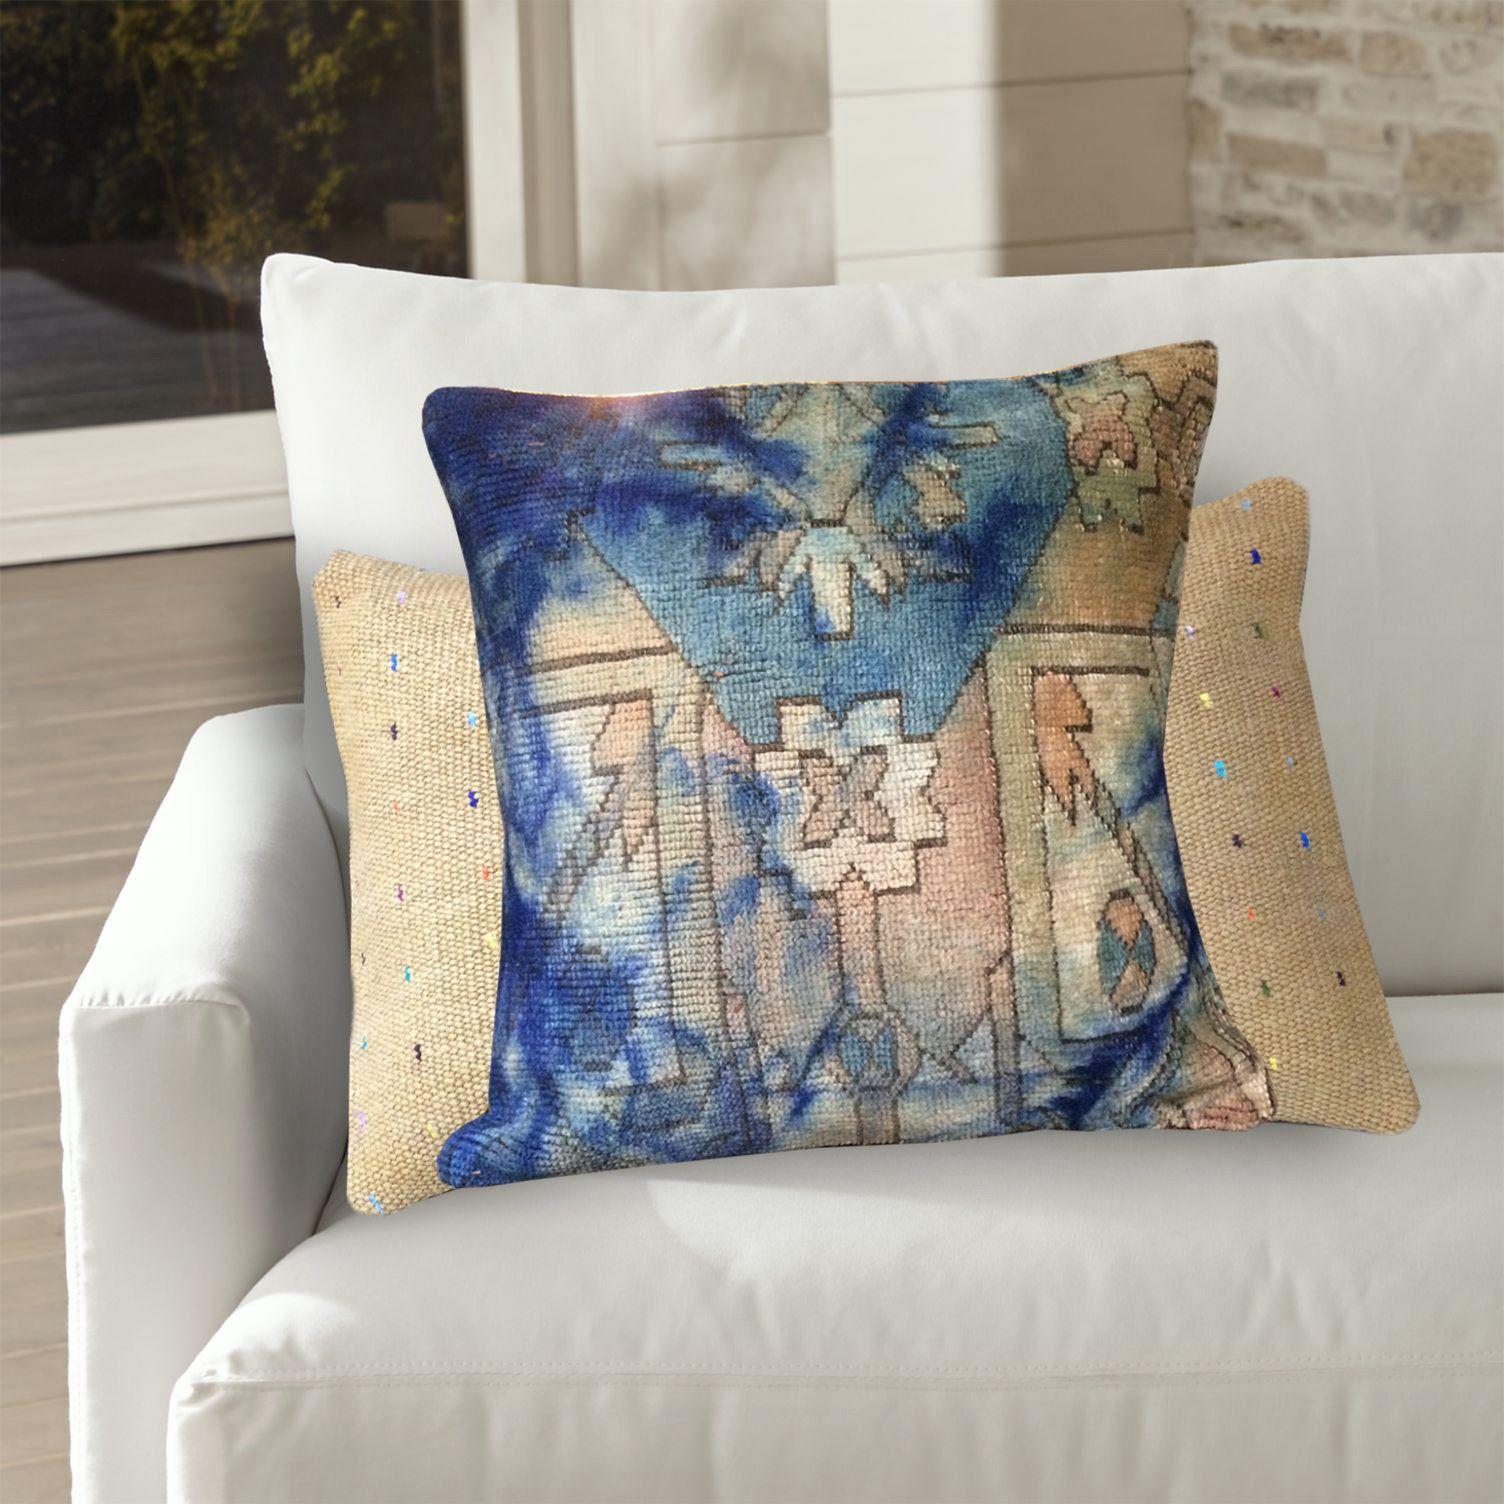 Turkish Kilim Pillow Kilim Cushions Rug Pillow Handmade Pillow Throw Pillow 20/'/' x 20/'/' inches Kilim Pillow cover Child room pillow618